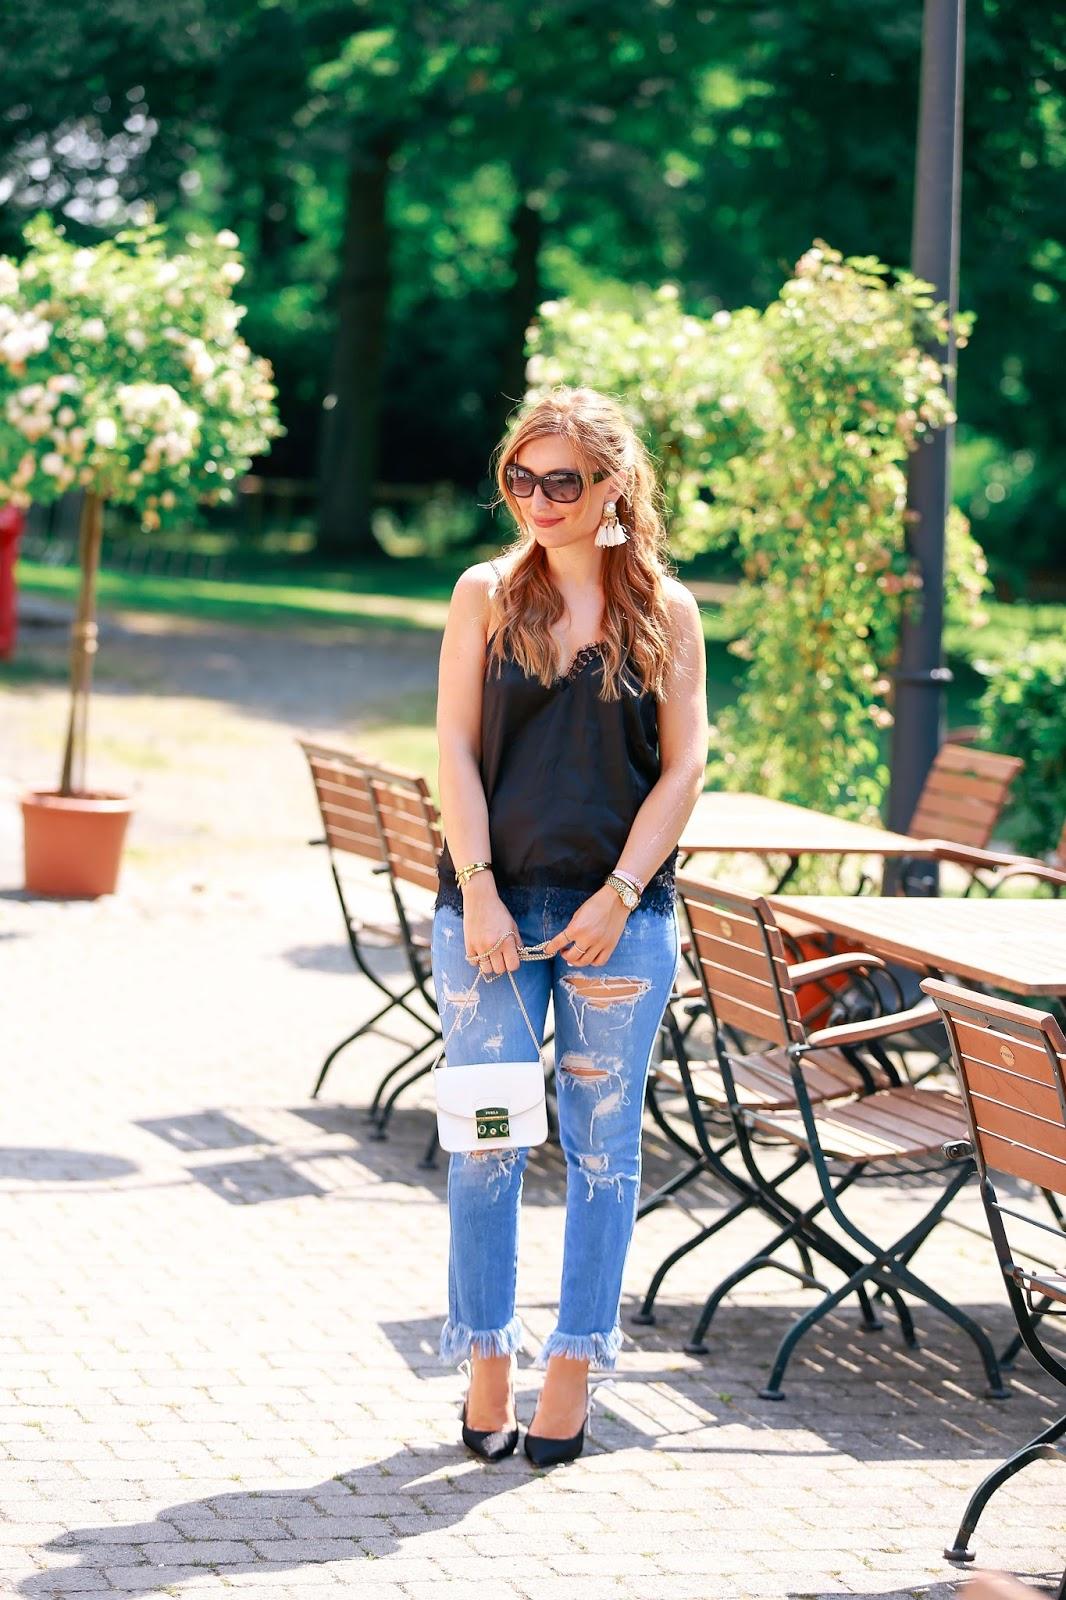 Wiekombiniert-man-ein-seidentop-mit-ripped-jeans